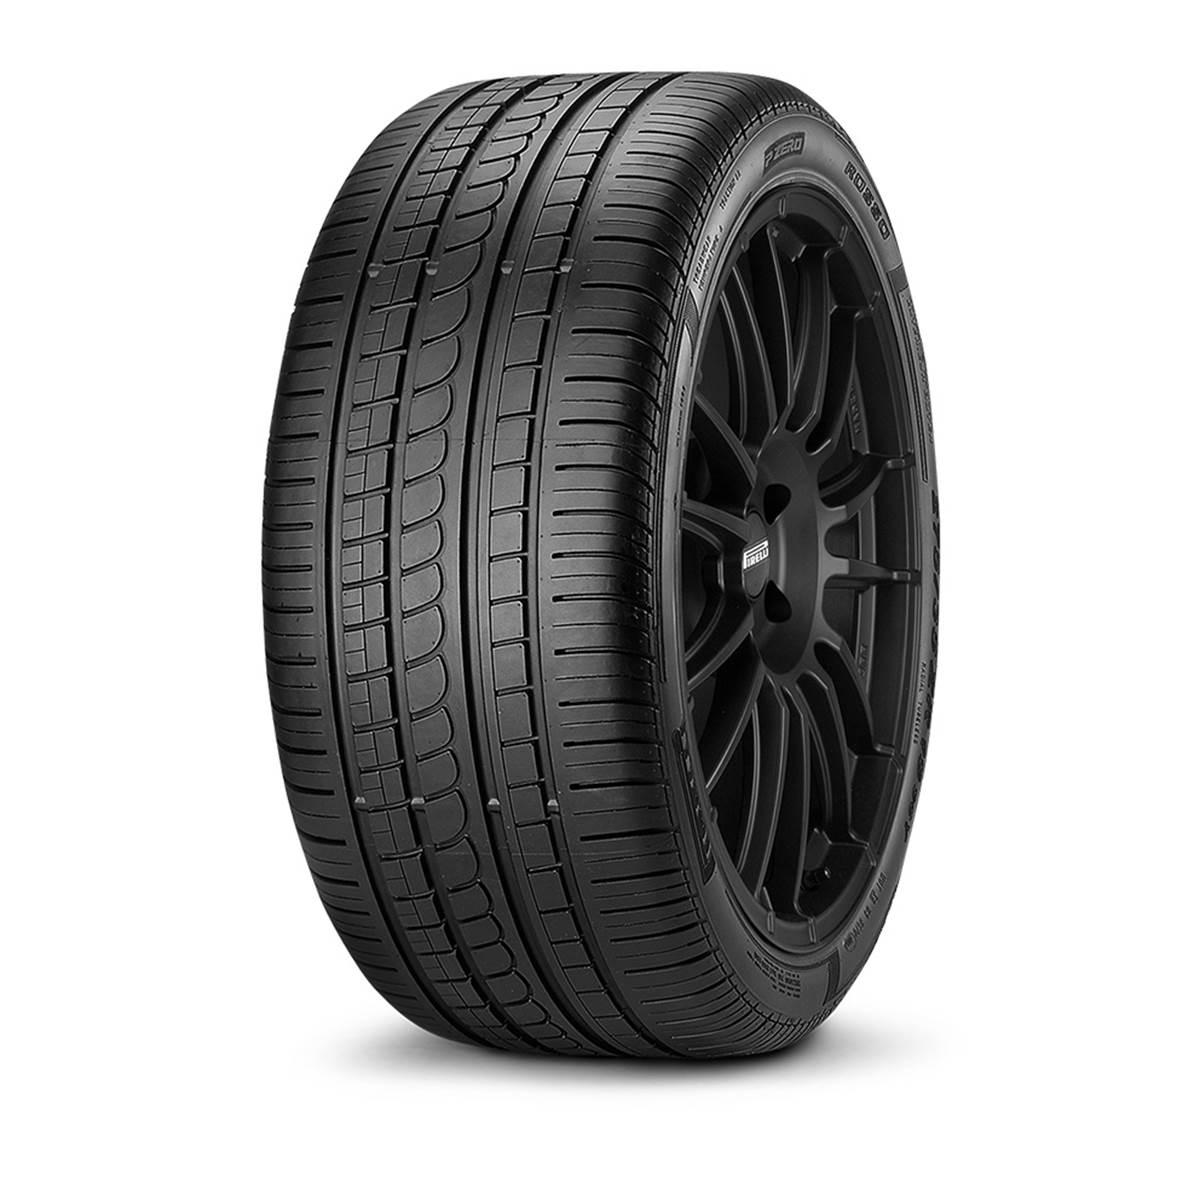 Pneu Pirelli 225/45R18 95Y Pzero Nero (Gt) XL